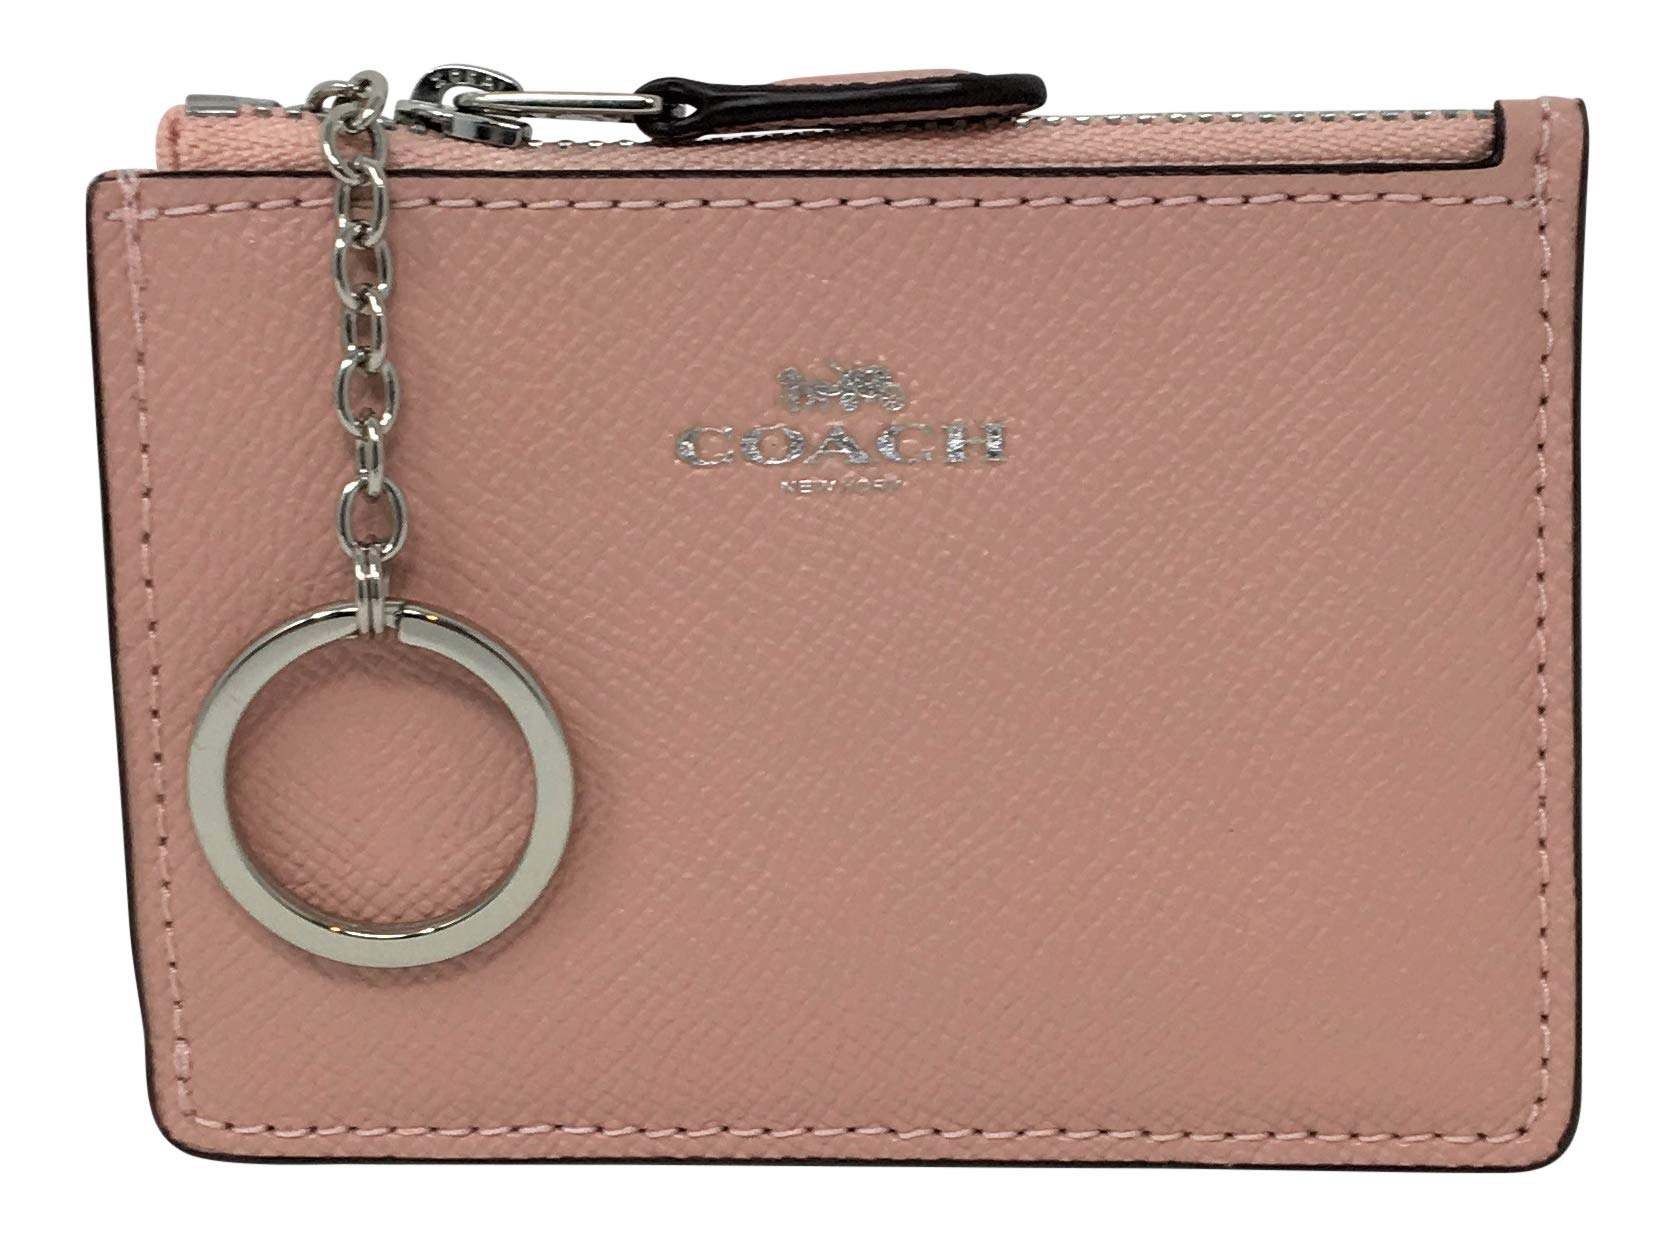 Coach F12186 Mini Skinny ID Case In Crossgrain Leather Petal